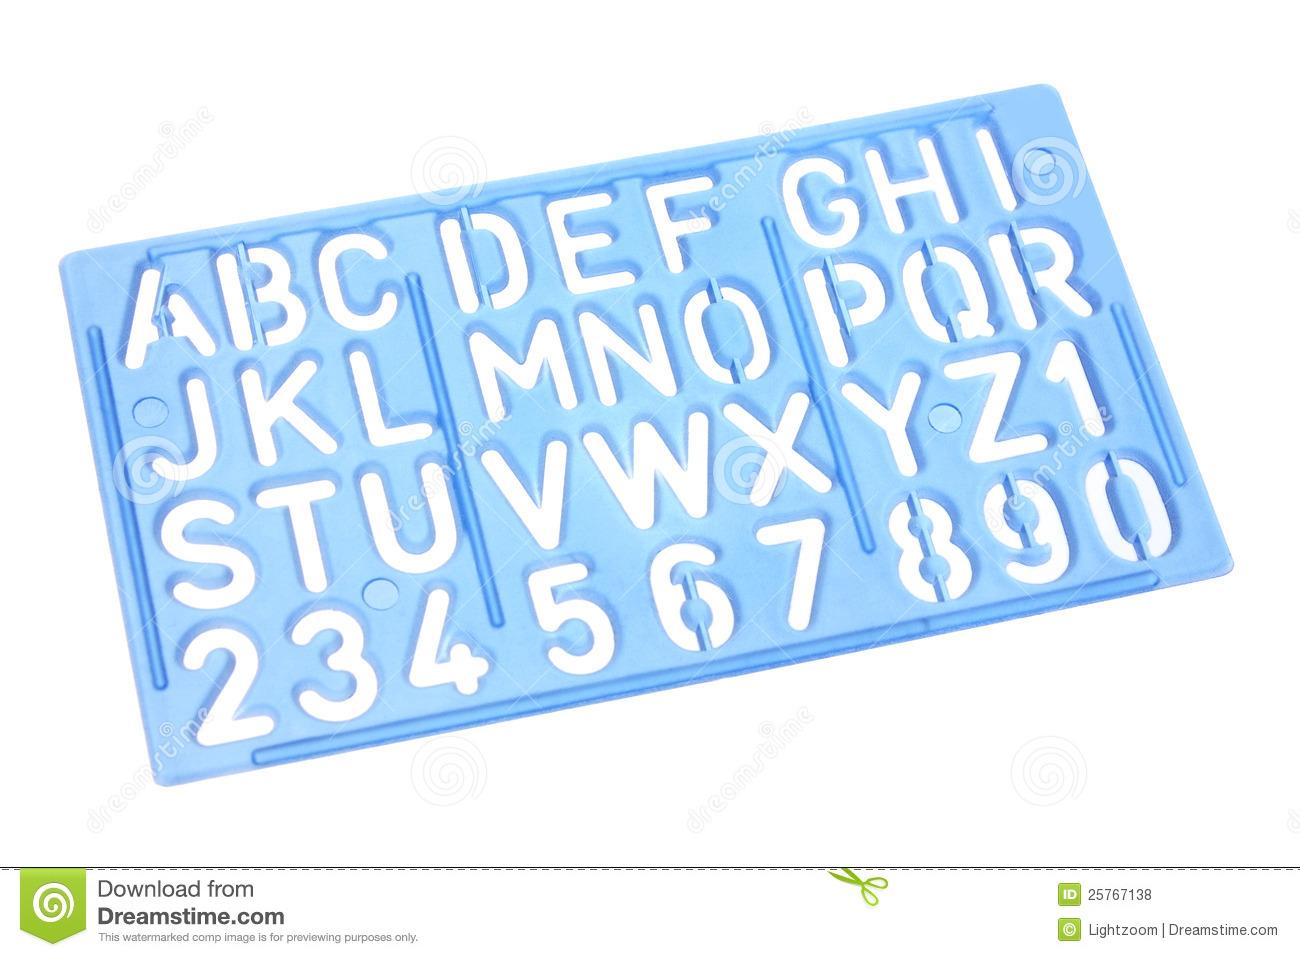 Alphabet stencil clip art.